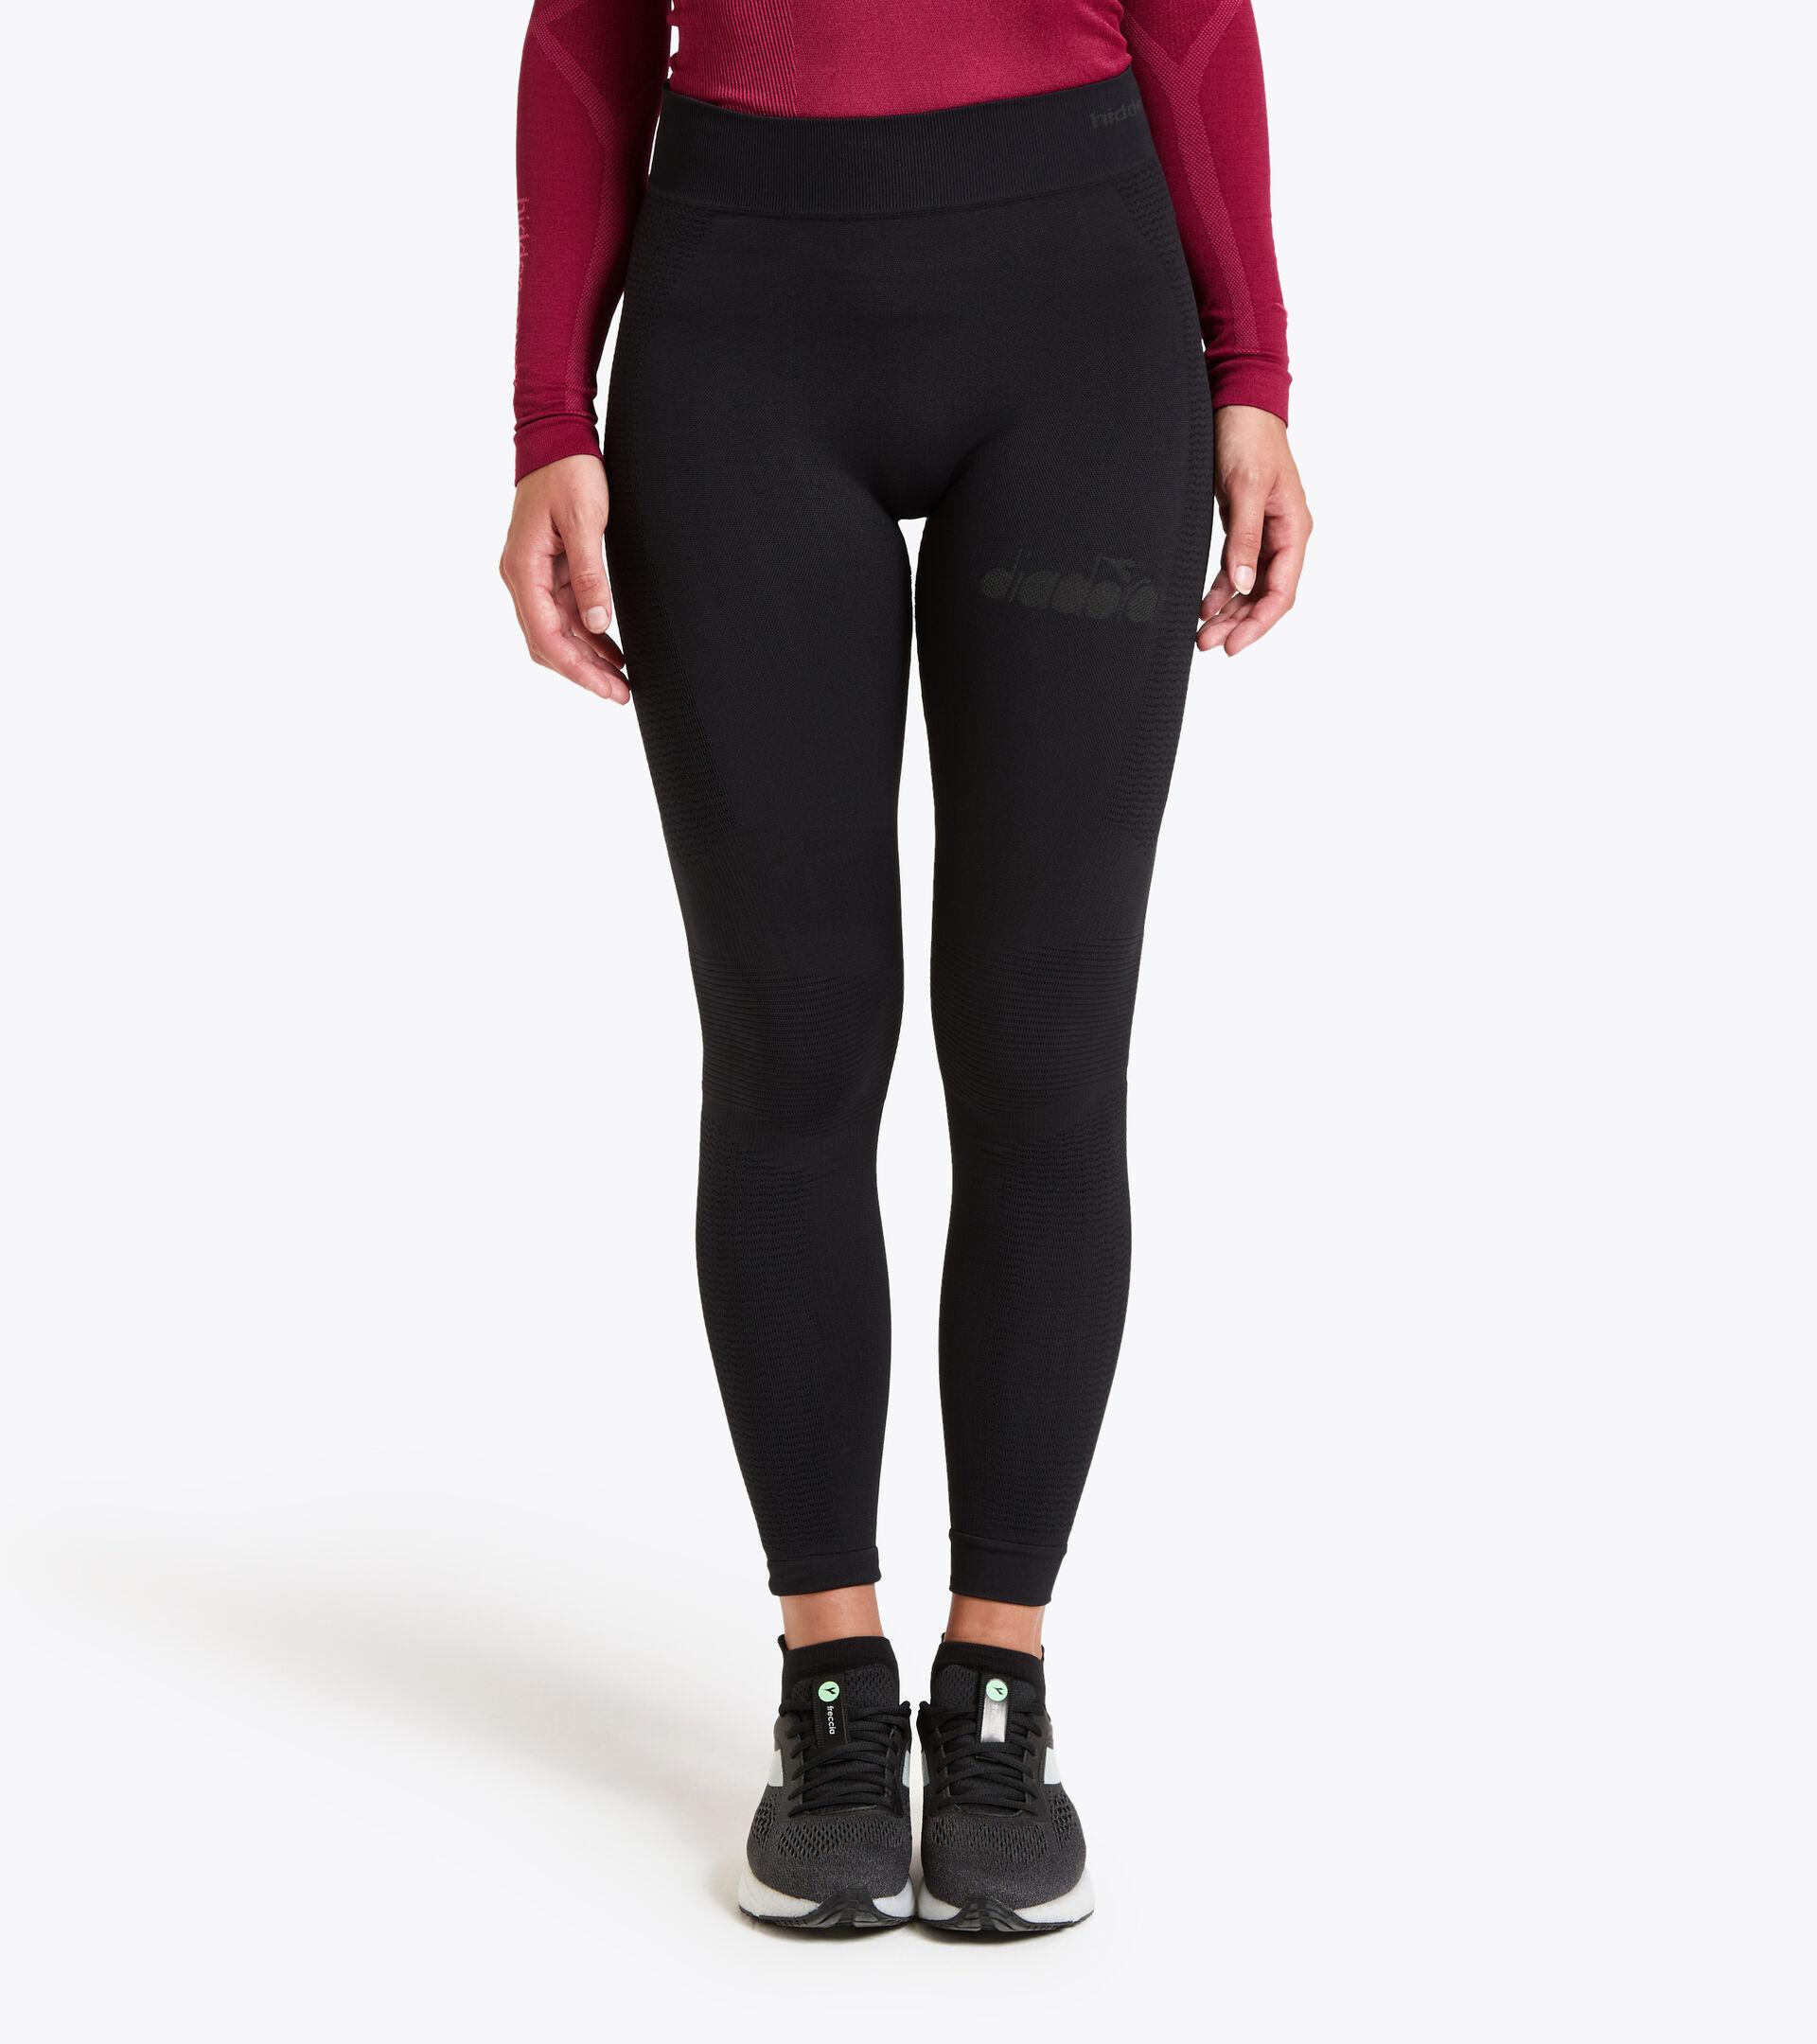 Pantalones para correr Made in Italy - Mujer L. HIDDEN POWER PANTS NEGRO - Diadora